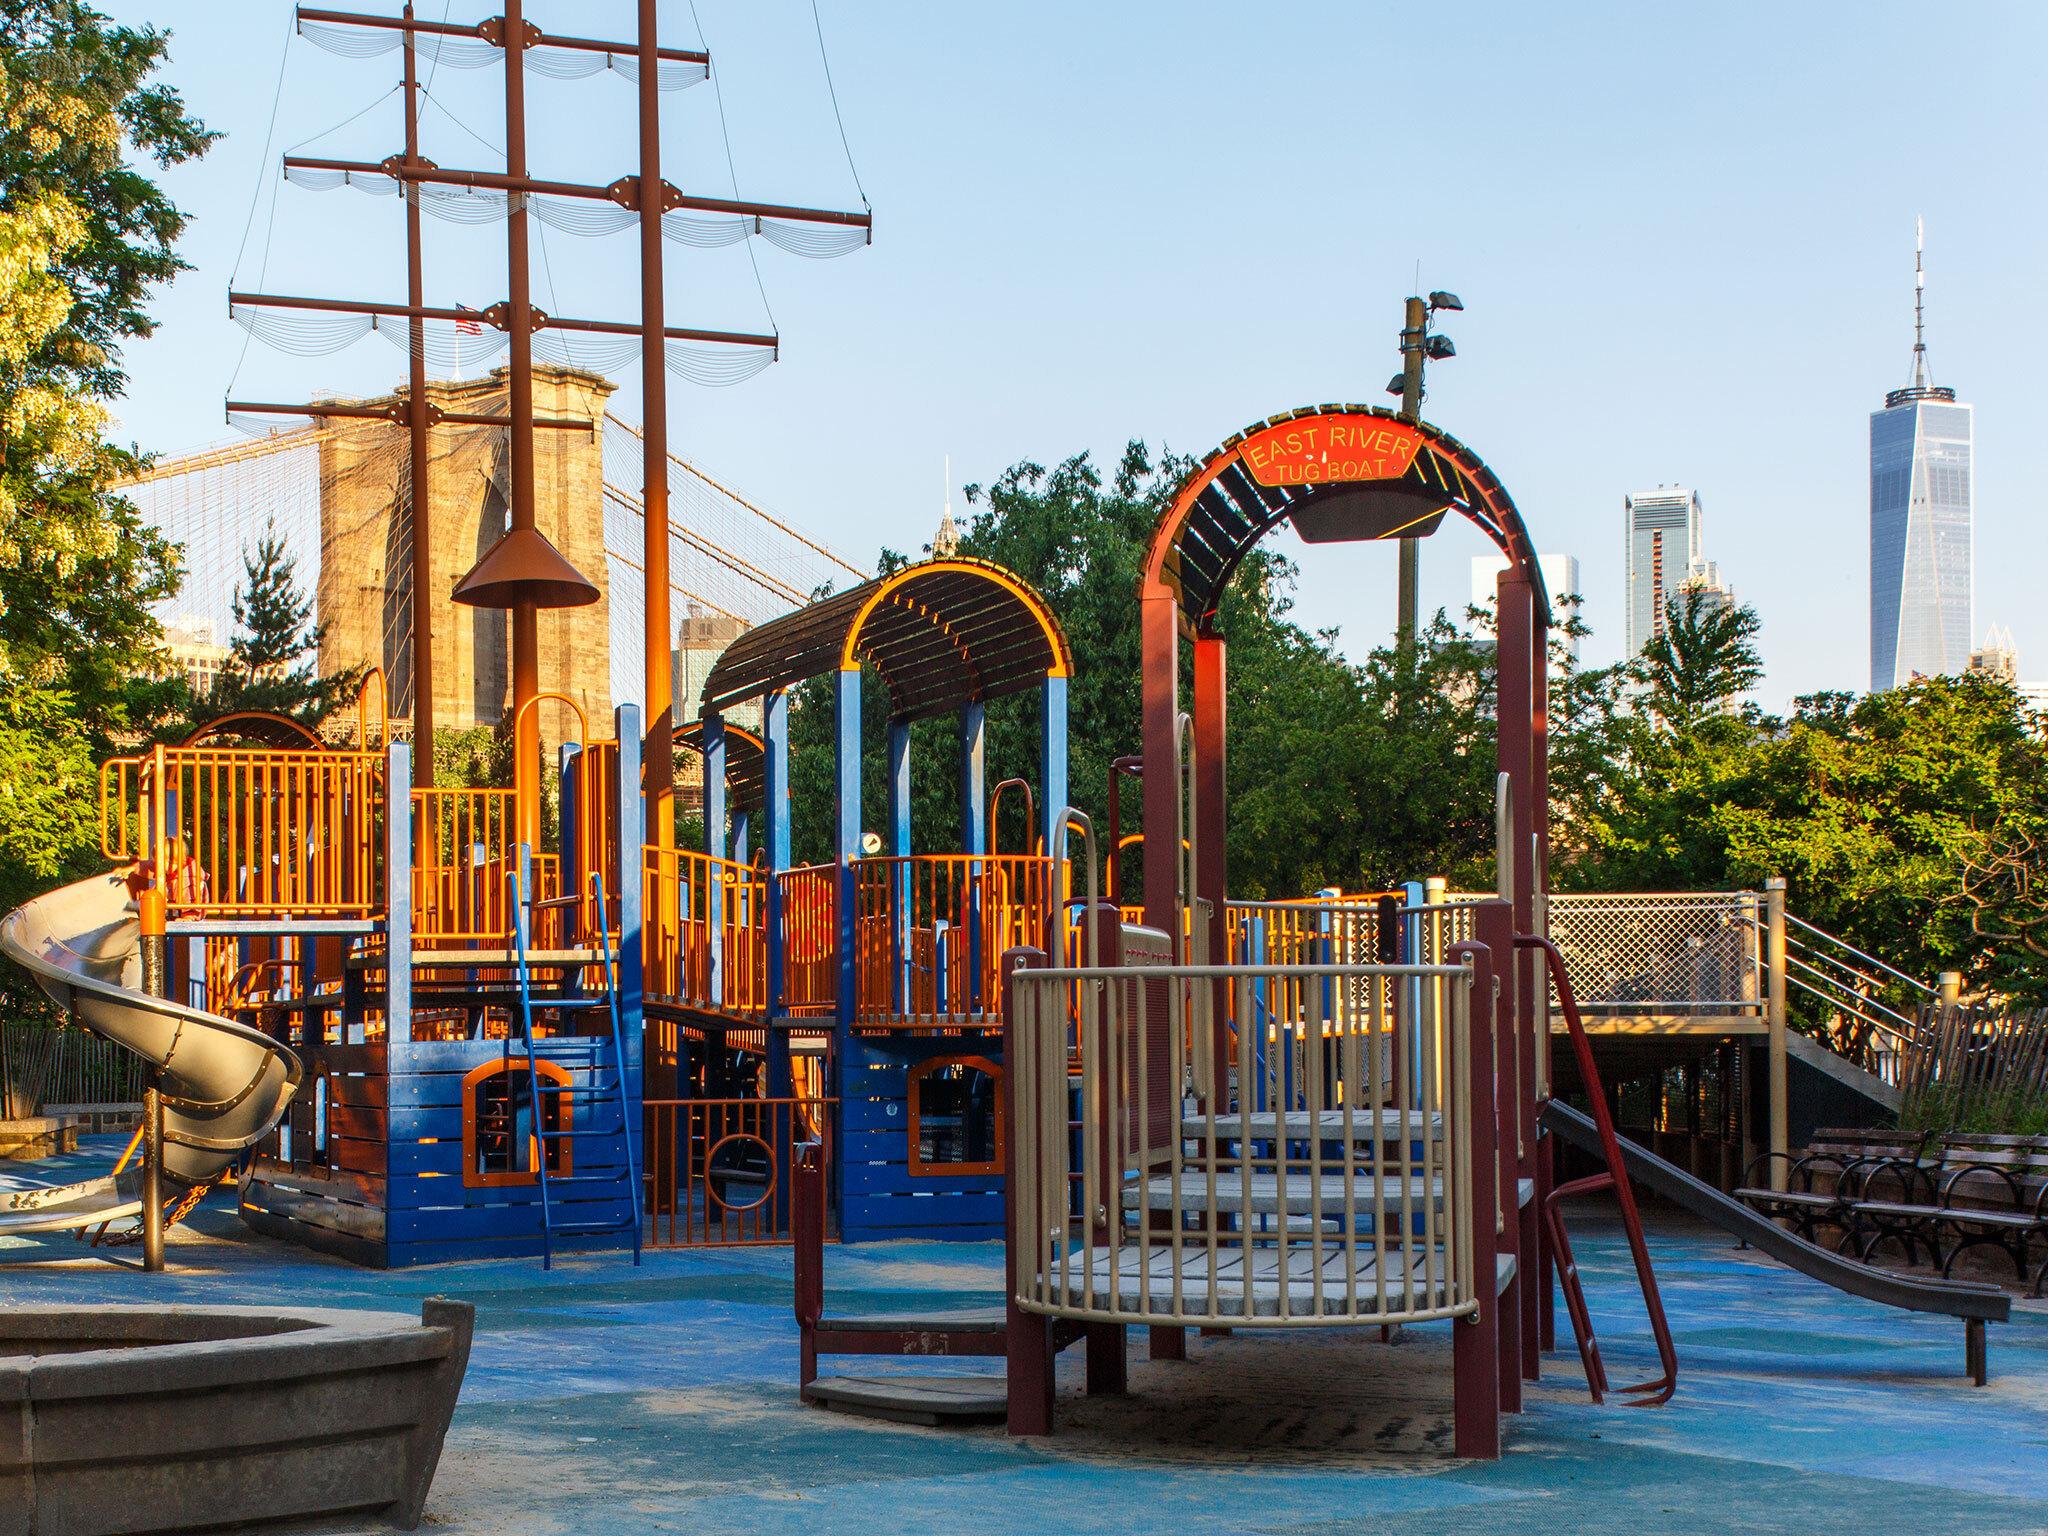 BK Playgrounds